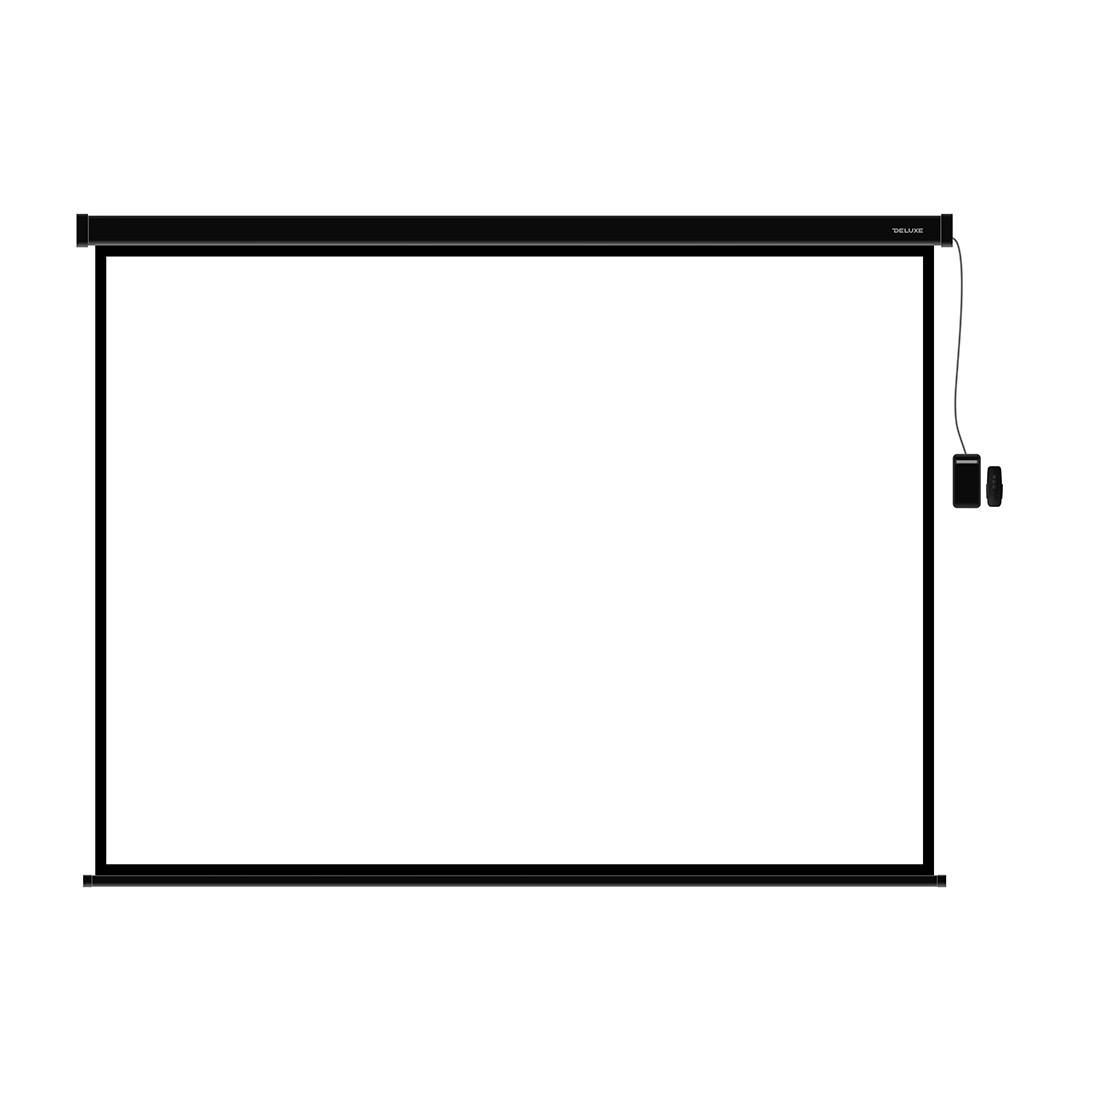 Экран моторизированный (с пультом Д/У) Deluxe DLS-ERC406х305B